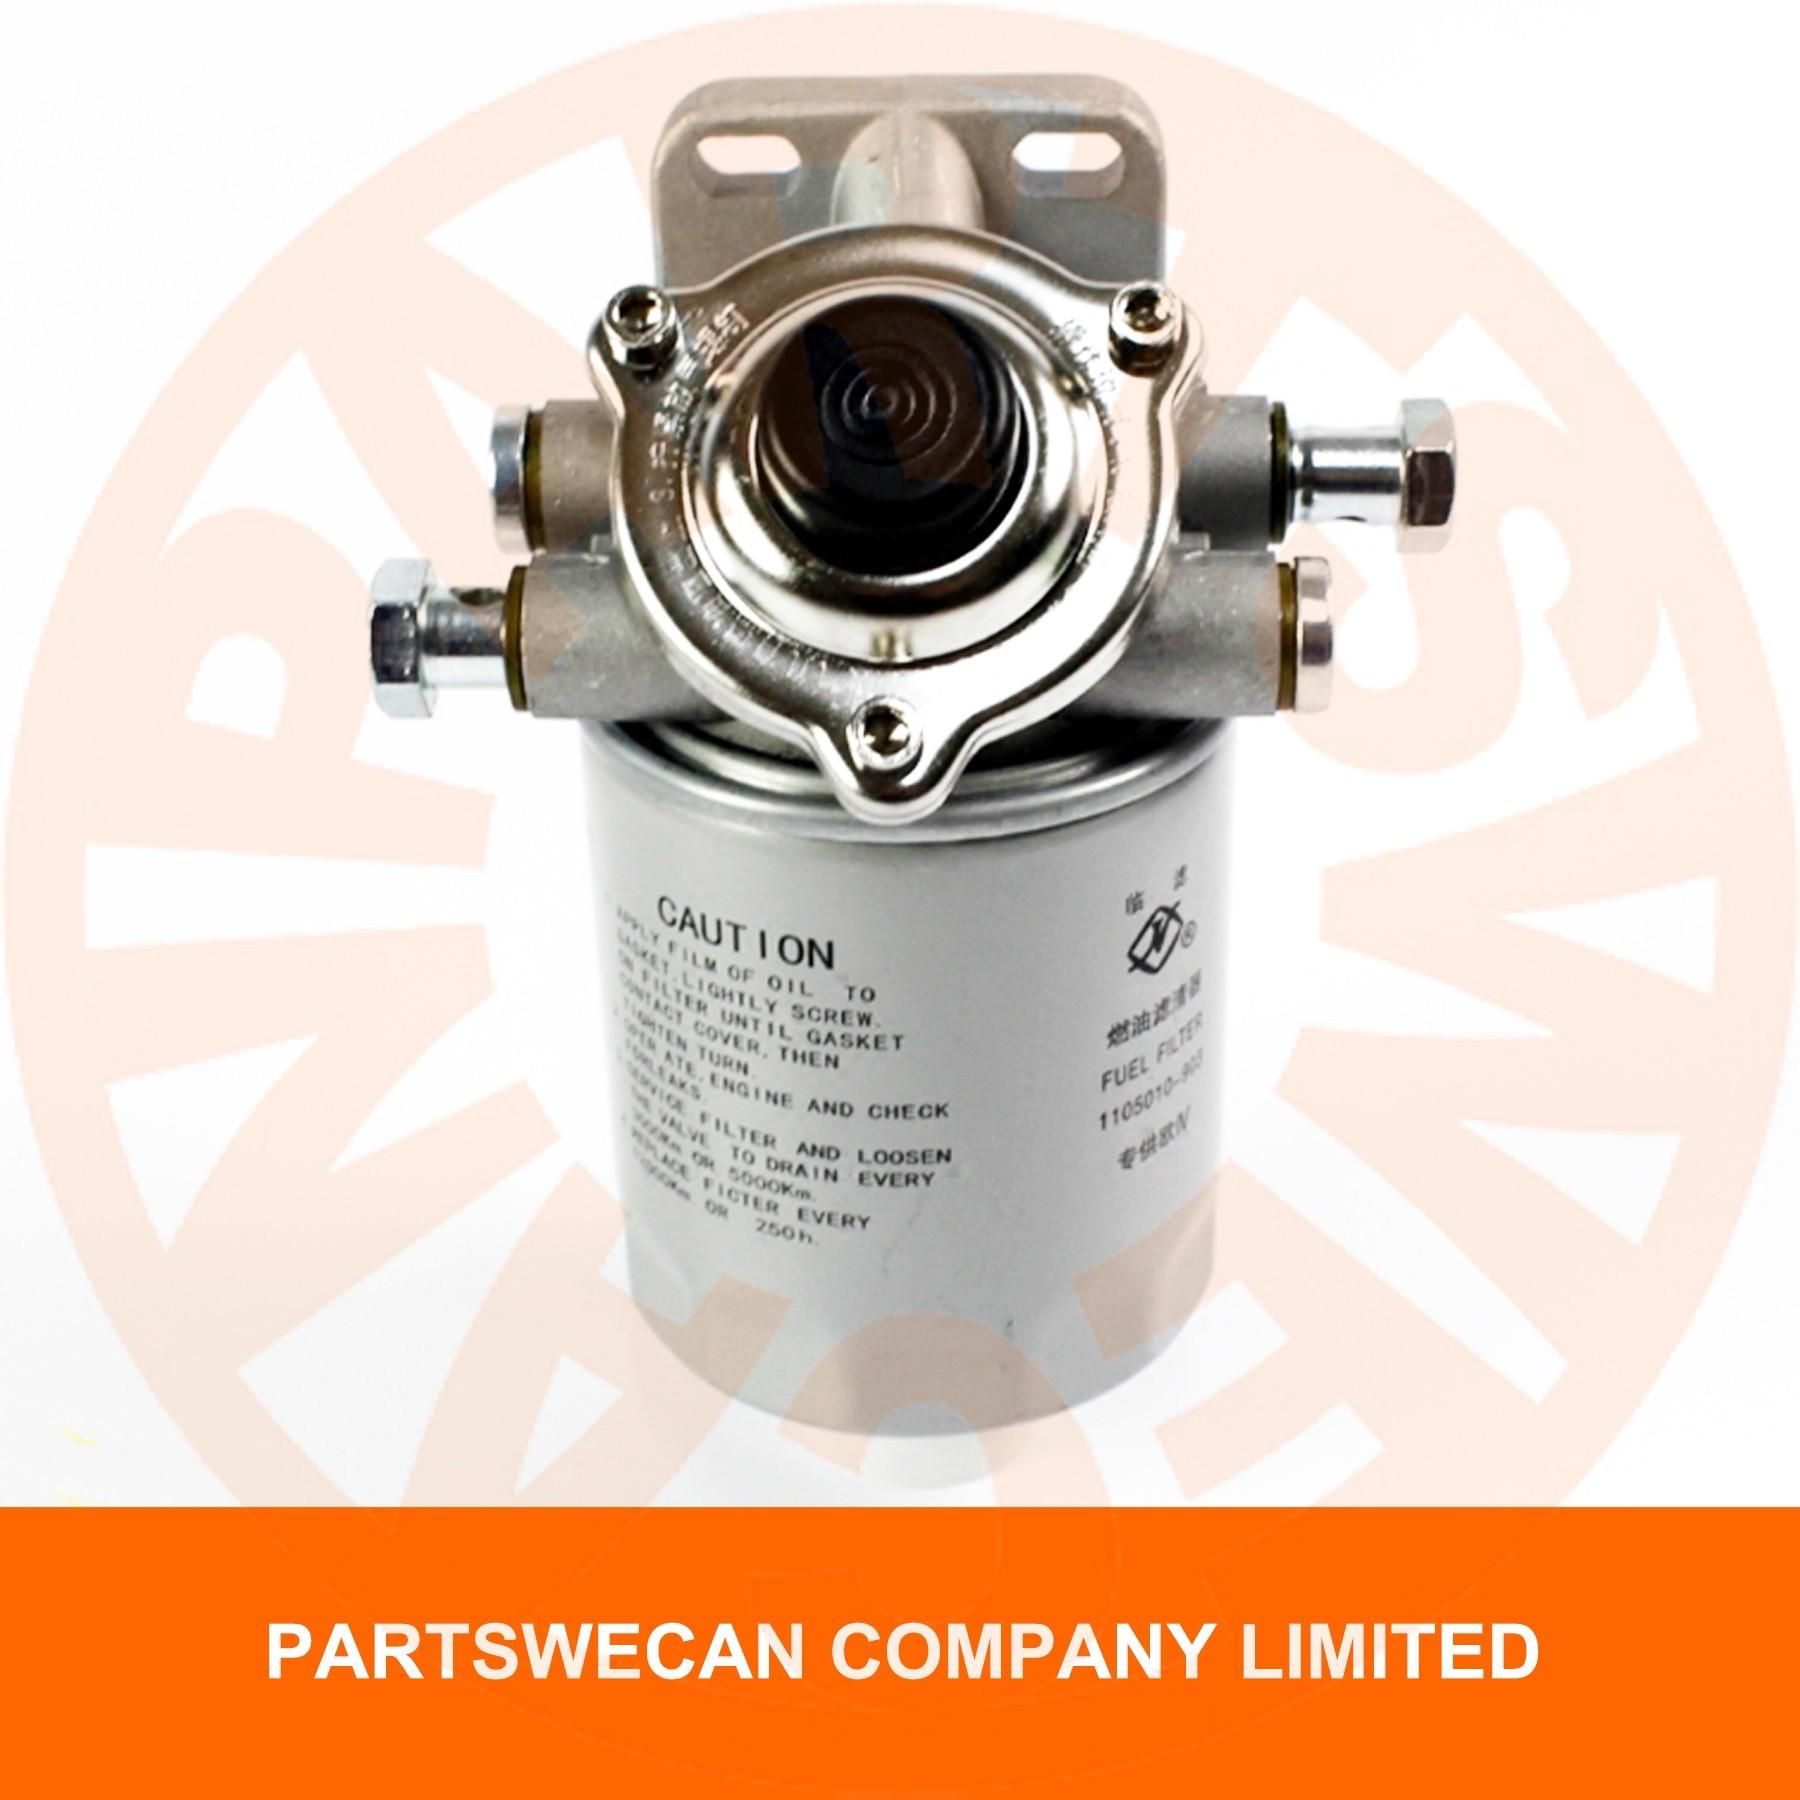 fuel filter assy 4d27g31-24100 xinchai 490bpg engine forklift aftermarket  parts – engine parts online store  partswecan